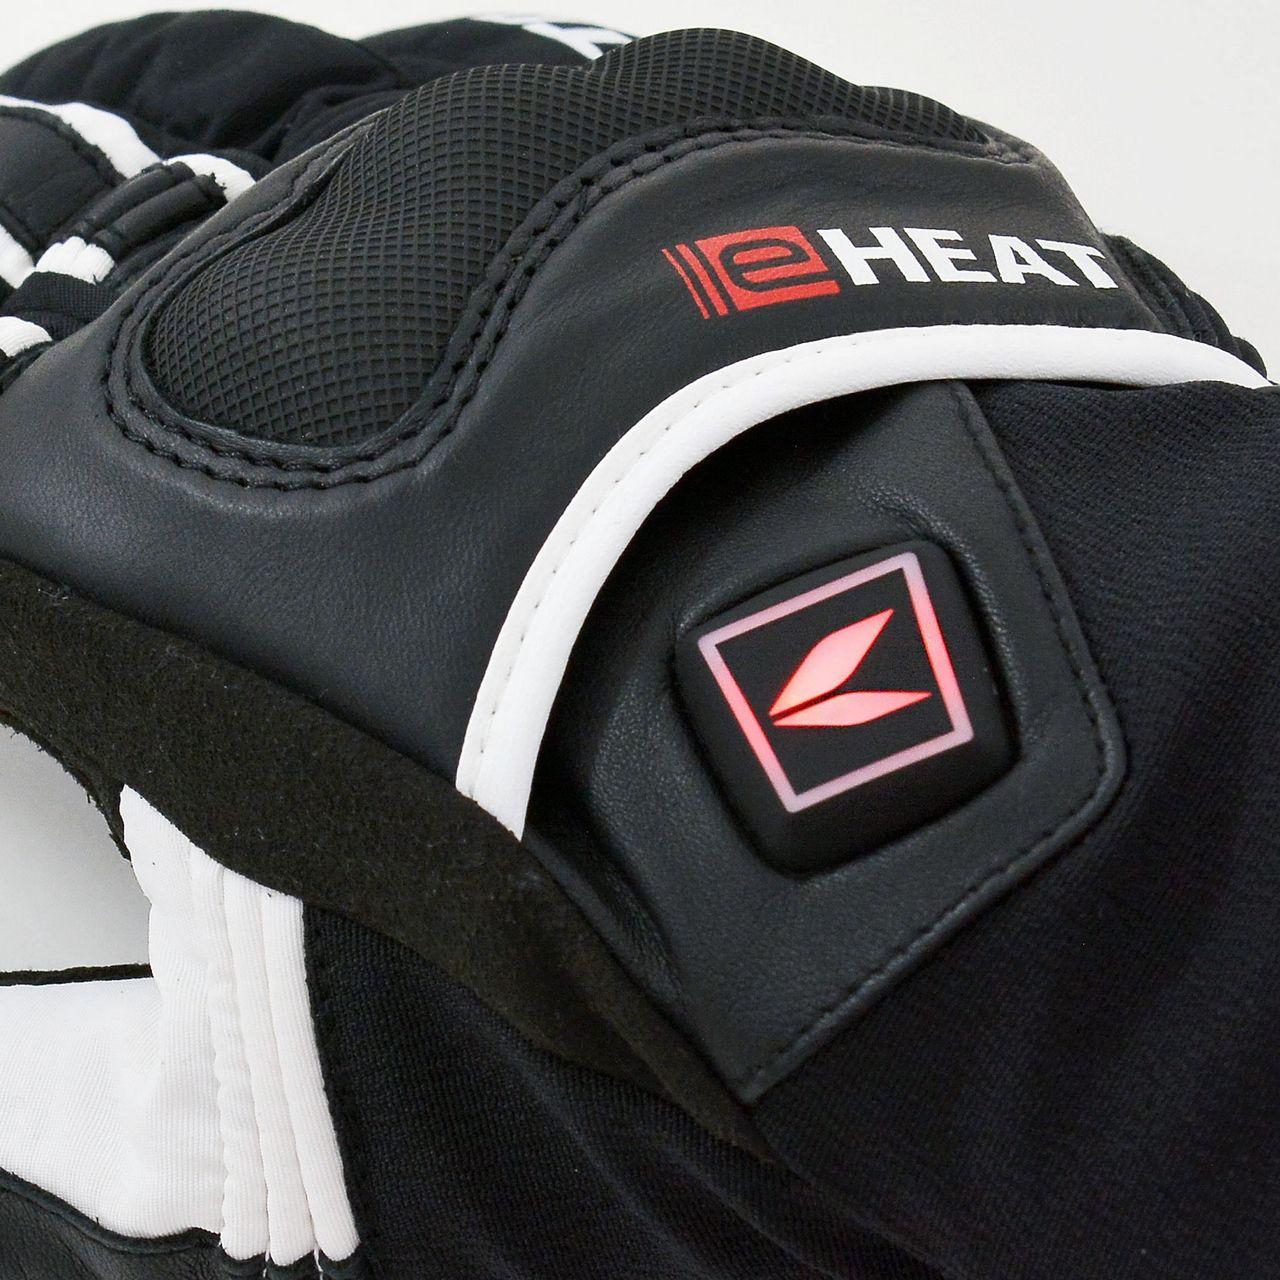 【RS TAICHI】RST621 e-HEAT  防護手套 - 「Webike-摩托百貨」